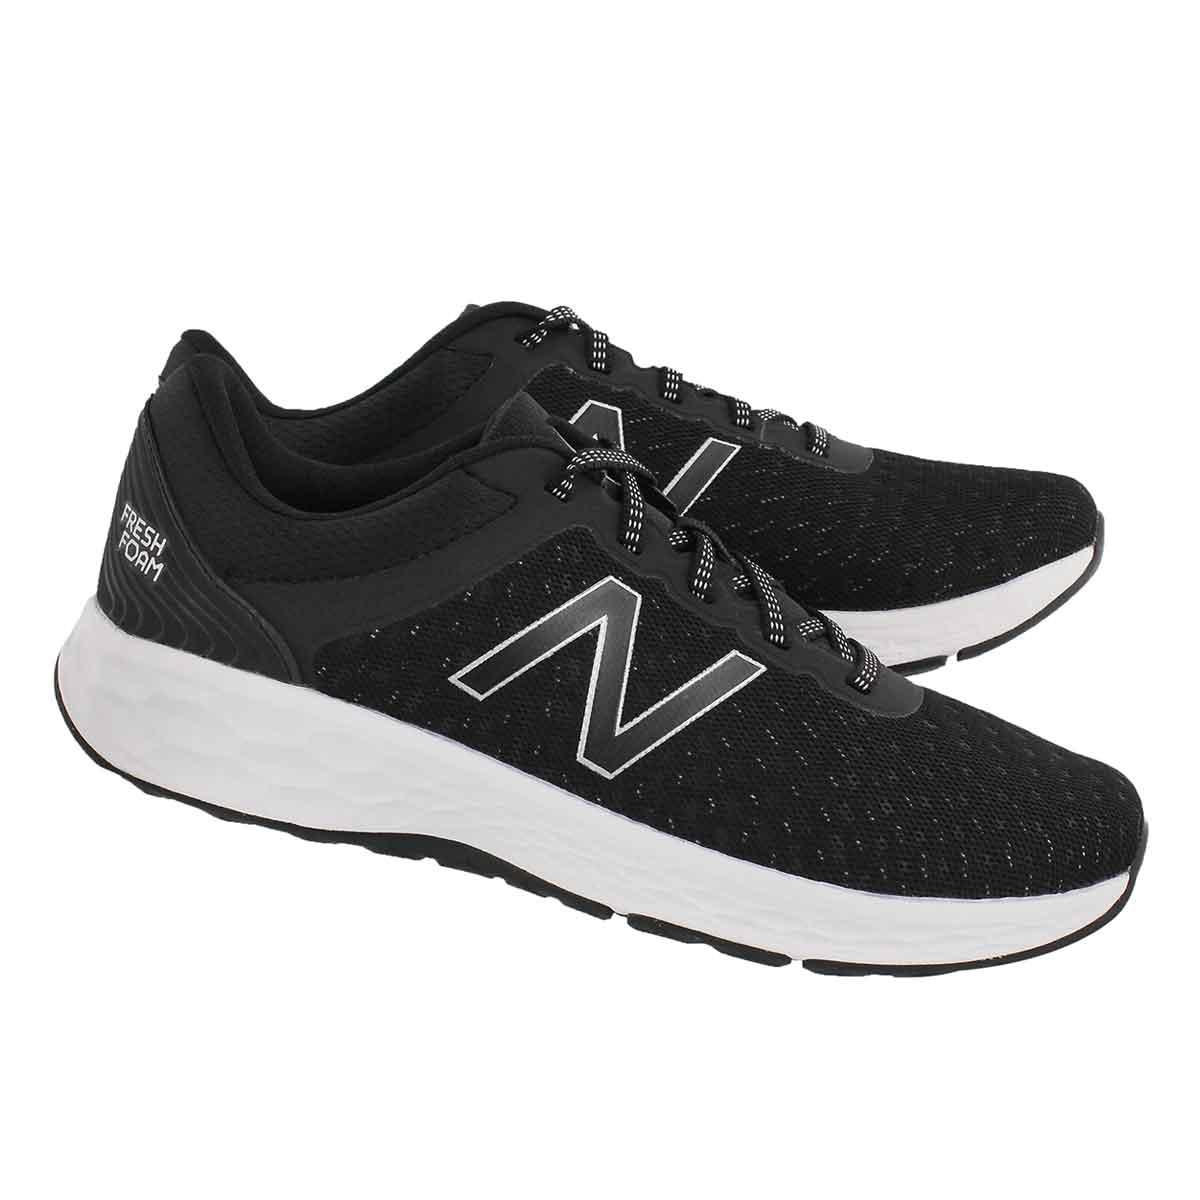 Mns Kaymin blk/overcast lace up sneaker